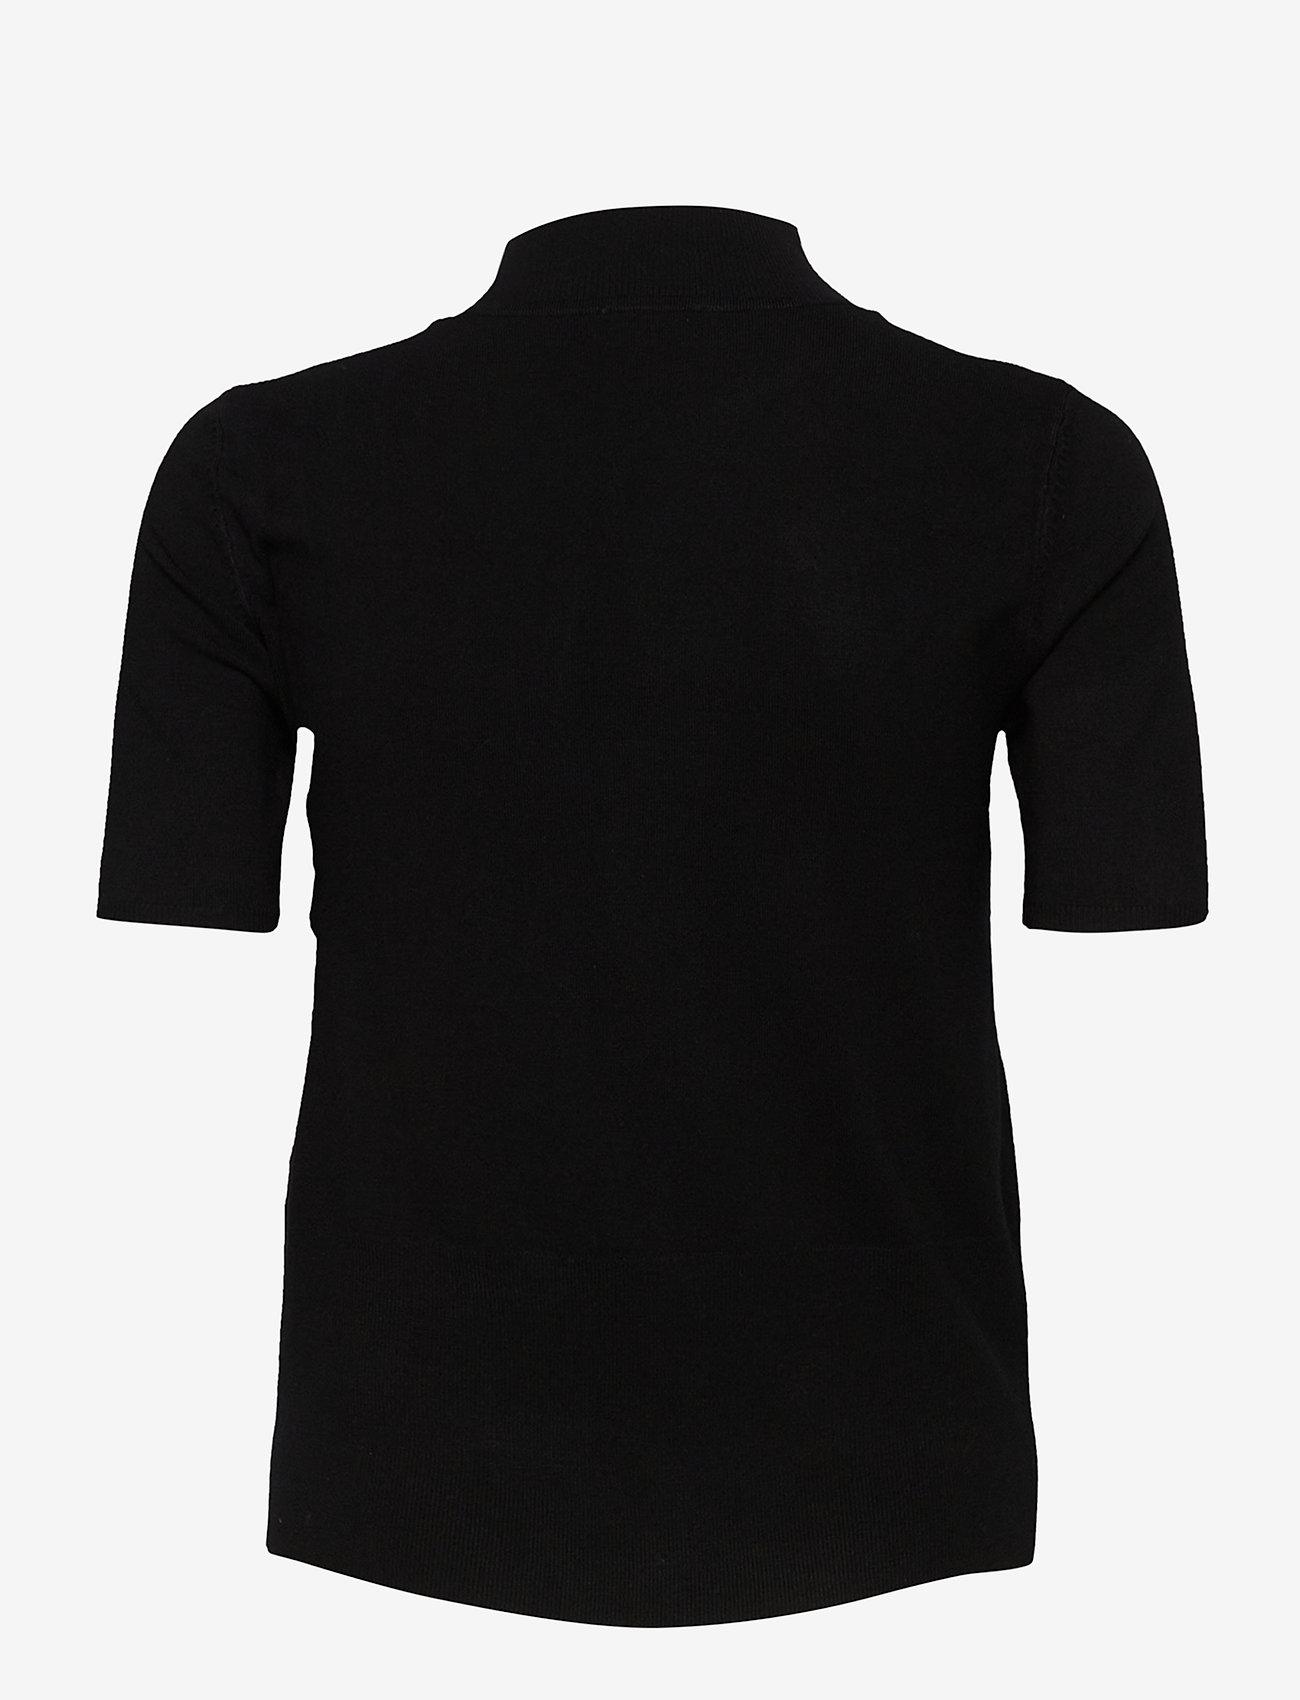 Taifun - PULLOVER 3/4-SLEEVE - stickade toppar & t-shirts - black - 1